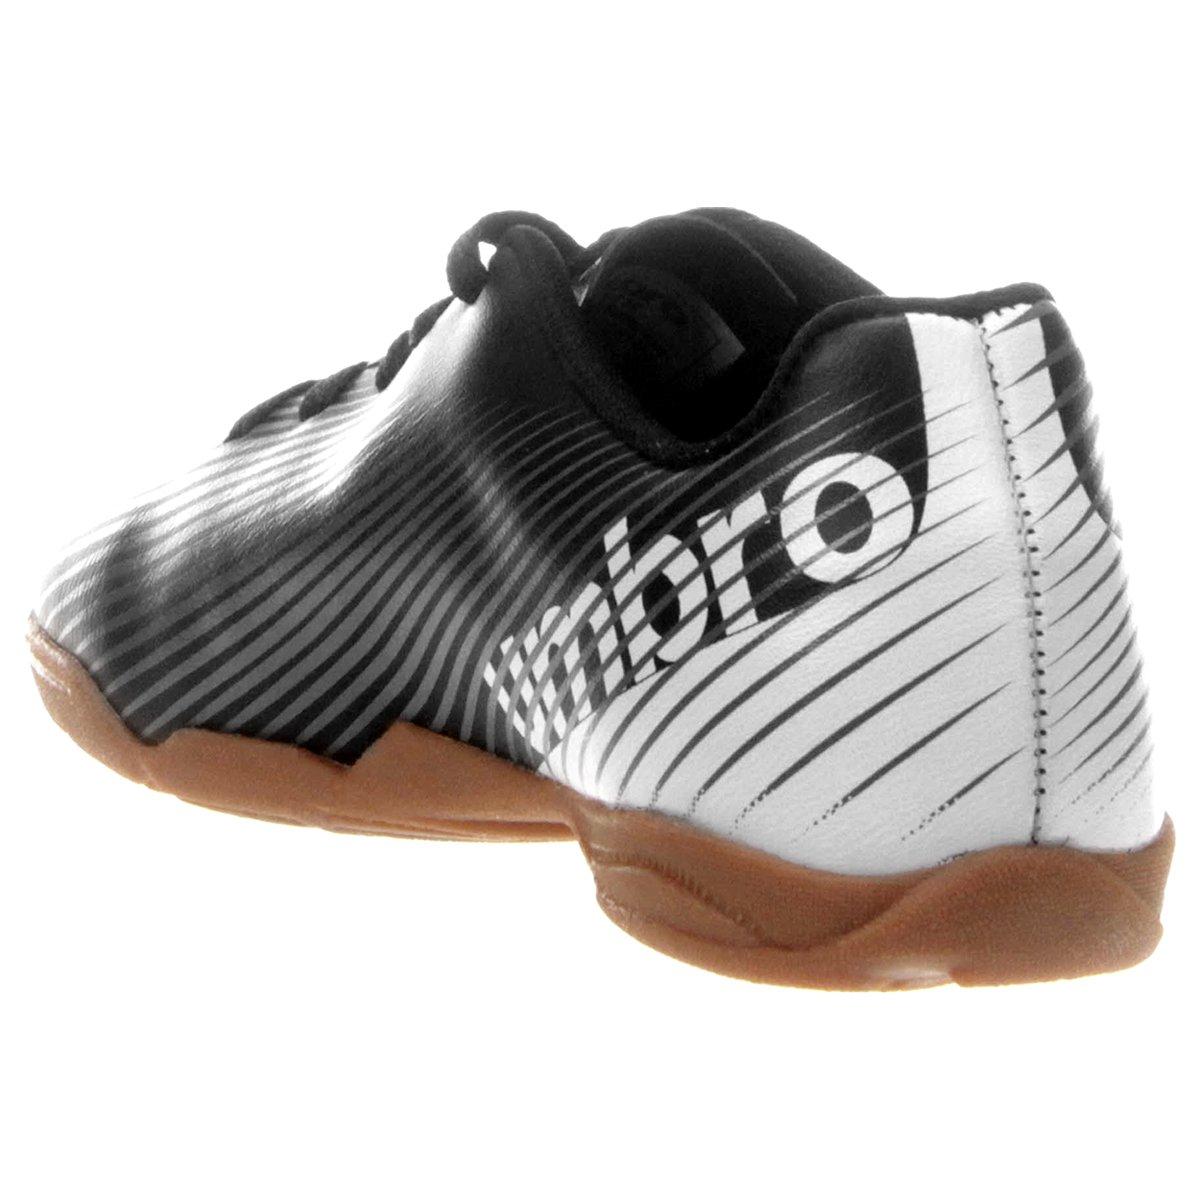 Chuteira Futsal Infantil Umbro Speed II - Compre Agora  163ac884bf3f0